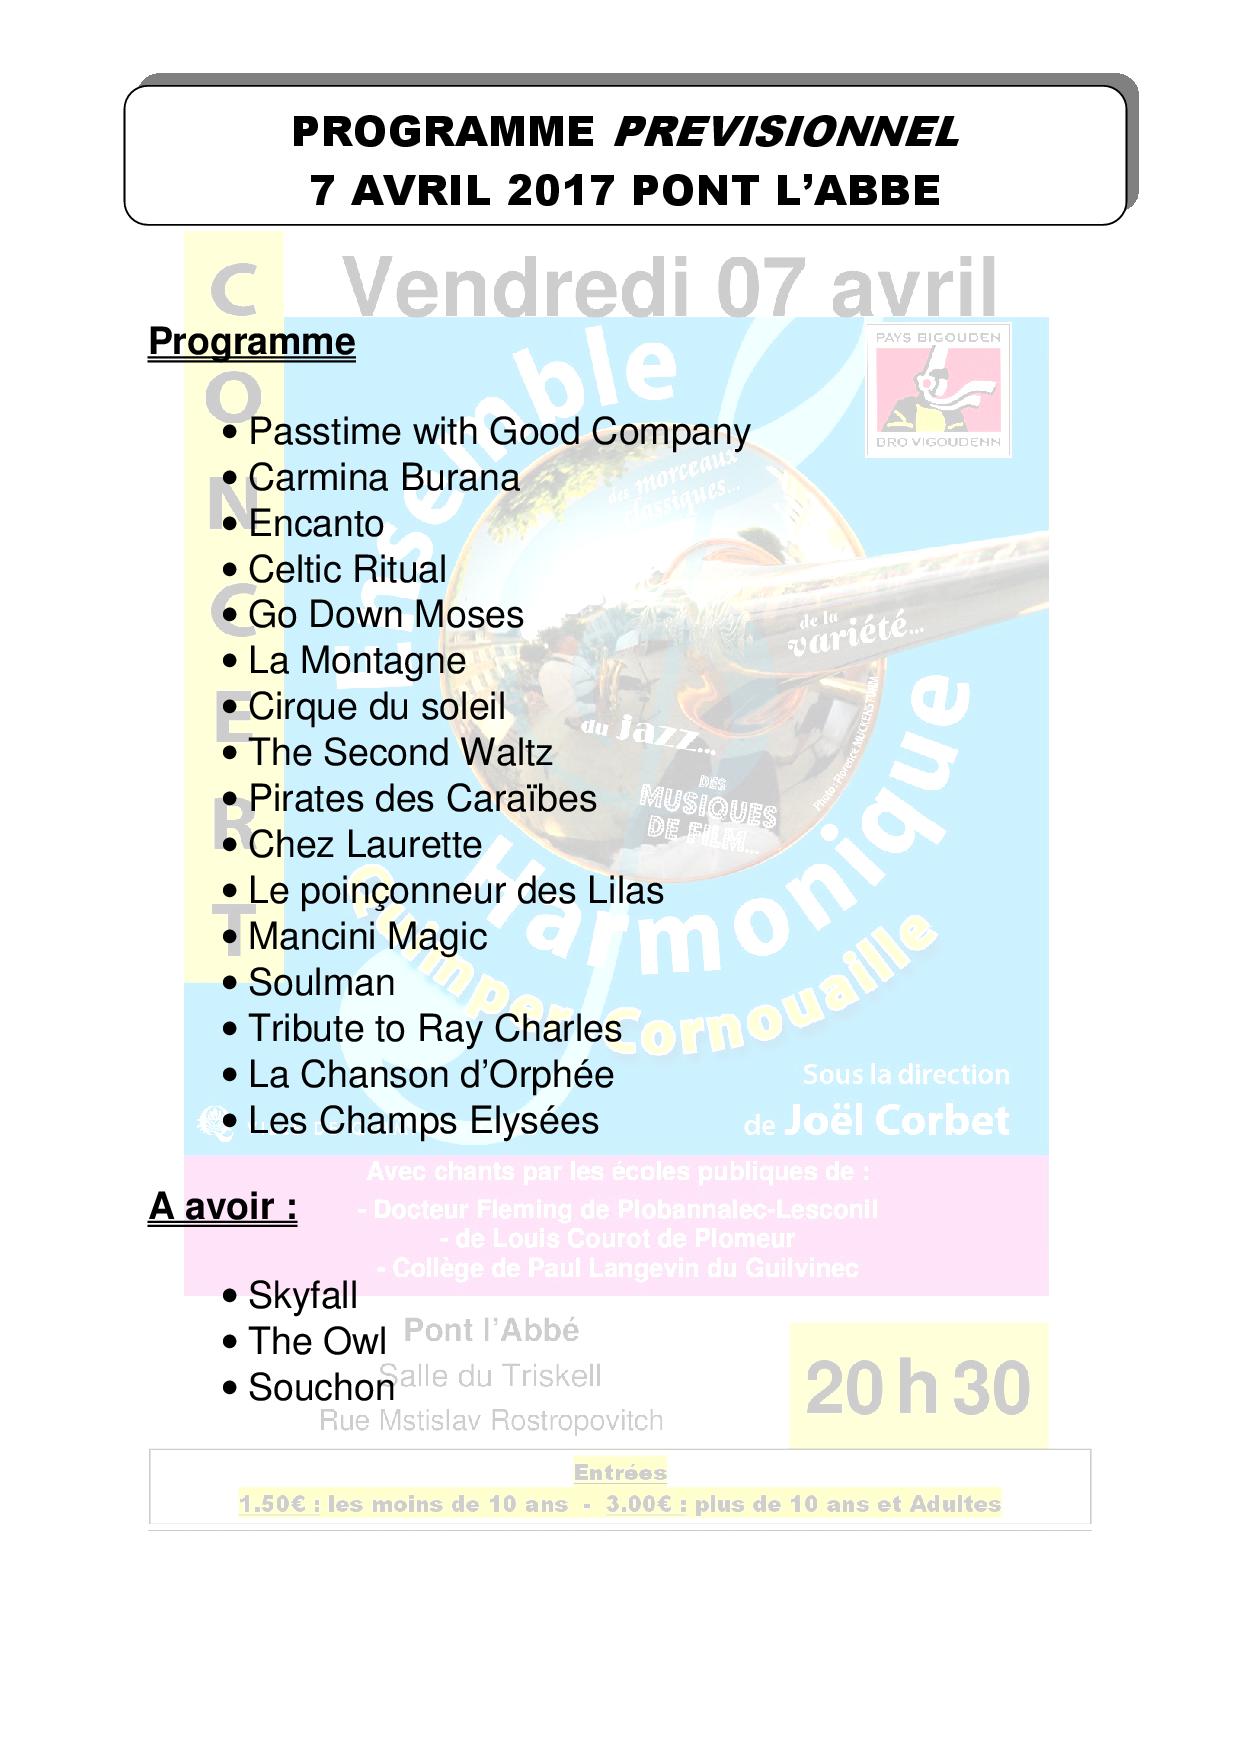 Programme concert pontl'abbé 070417docx.png